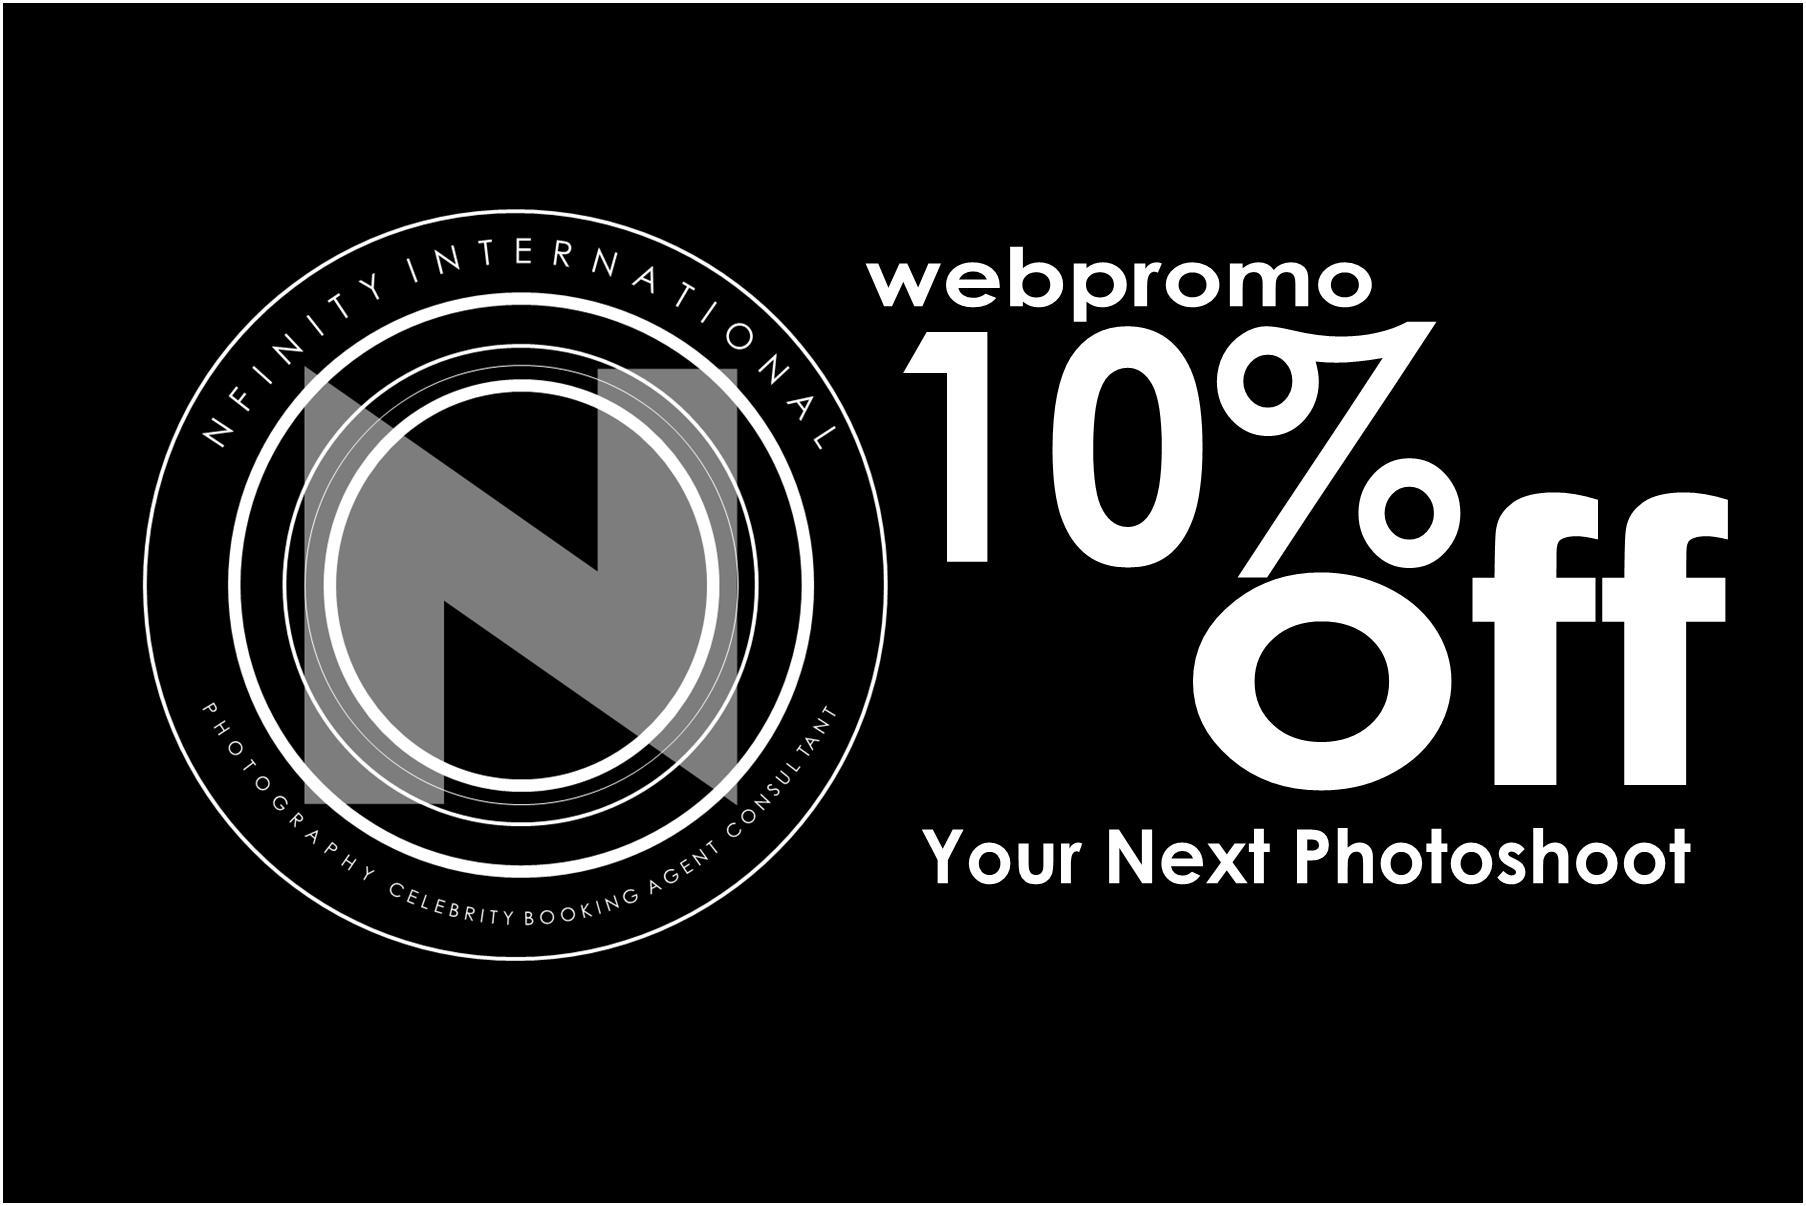 websitepromo.jpg